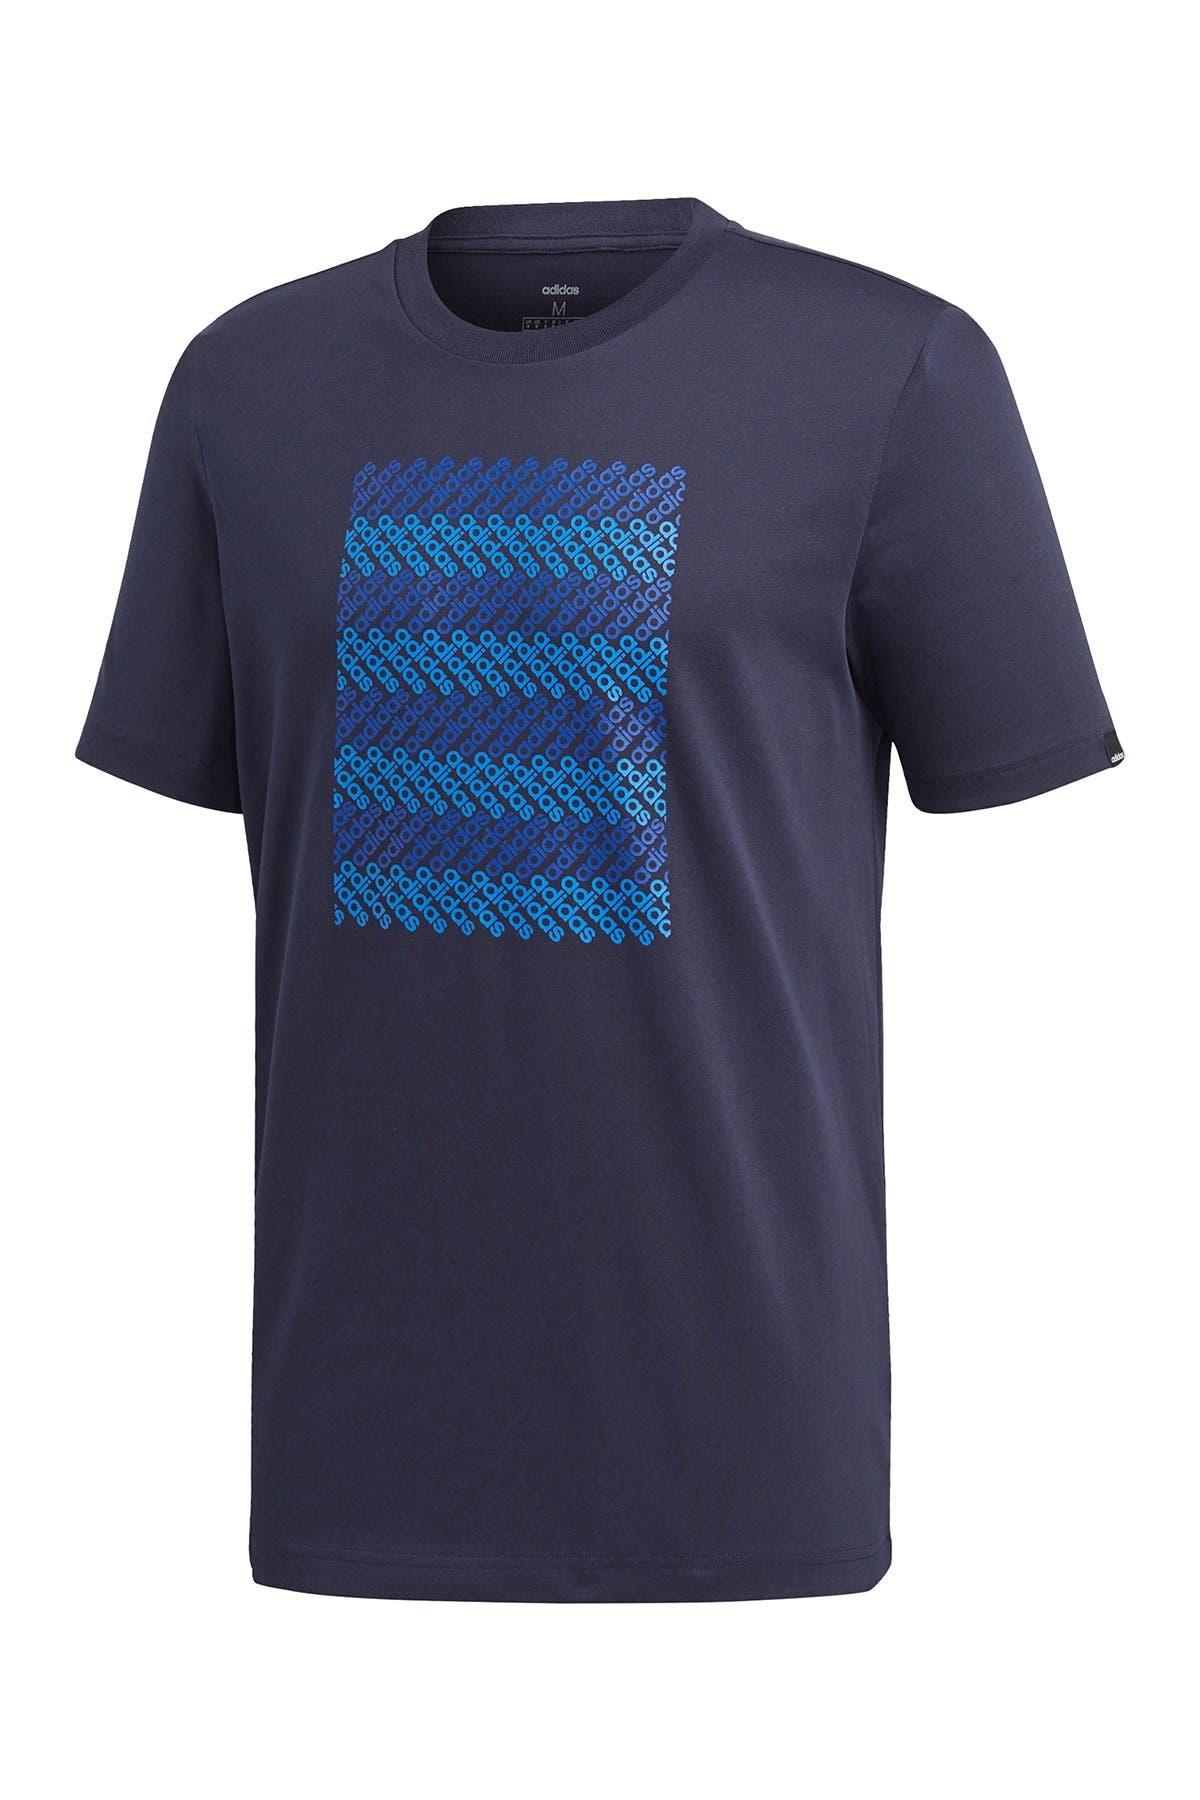 Image of adidas Logo Grid T-Shirt